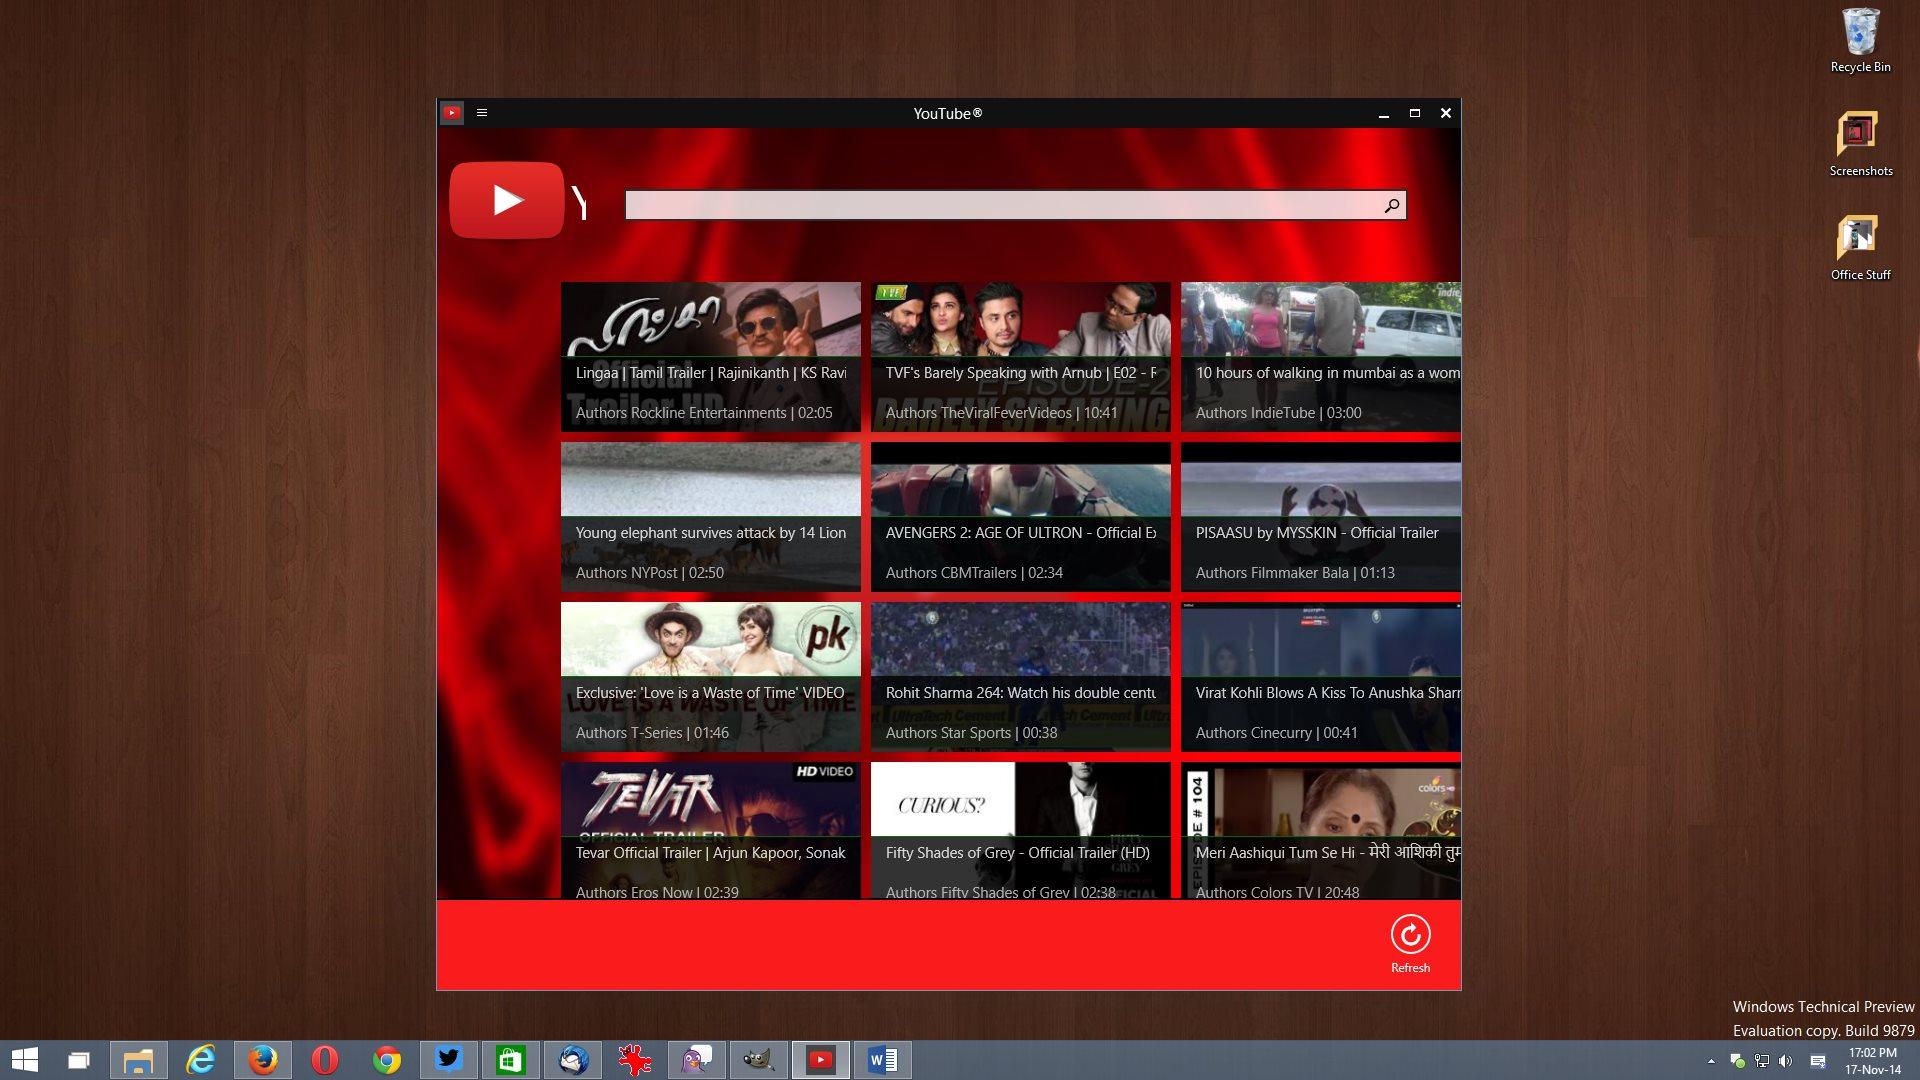 $4 YouTube App Arrives on Windows 8